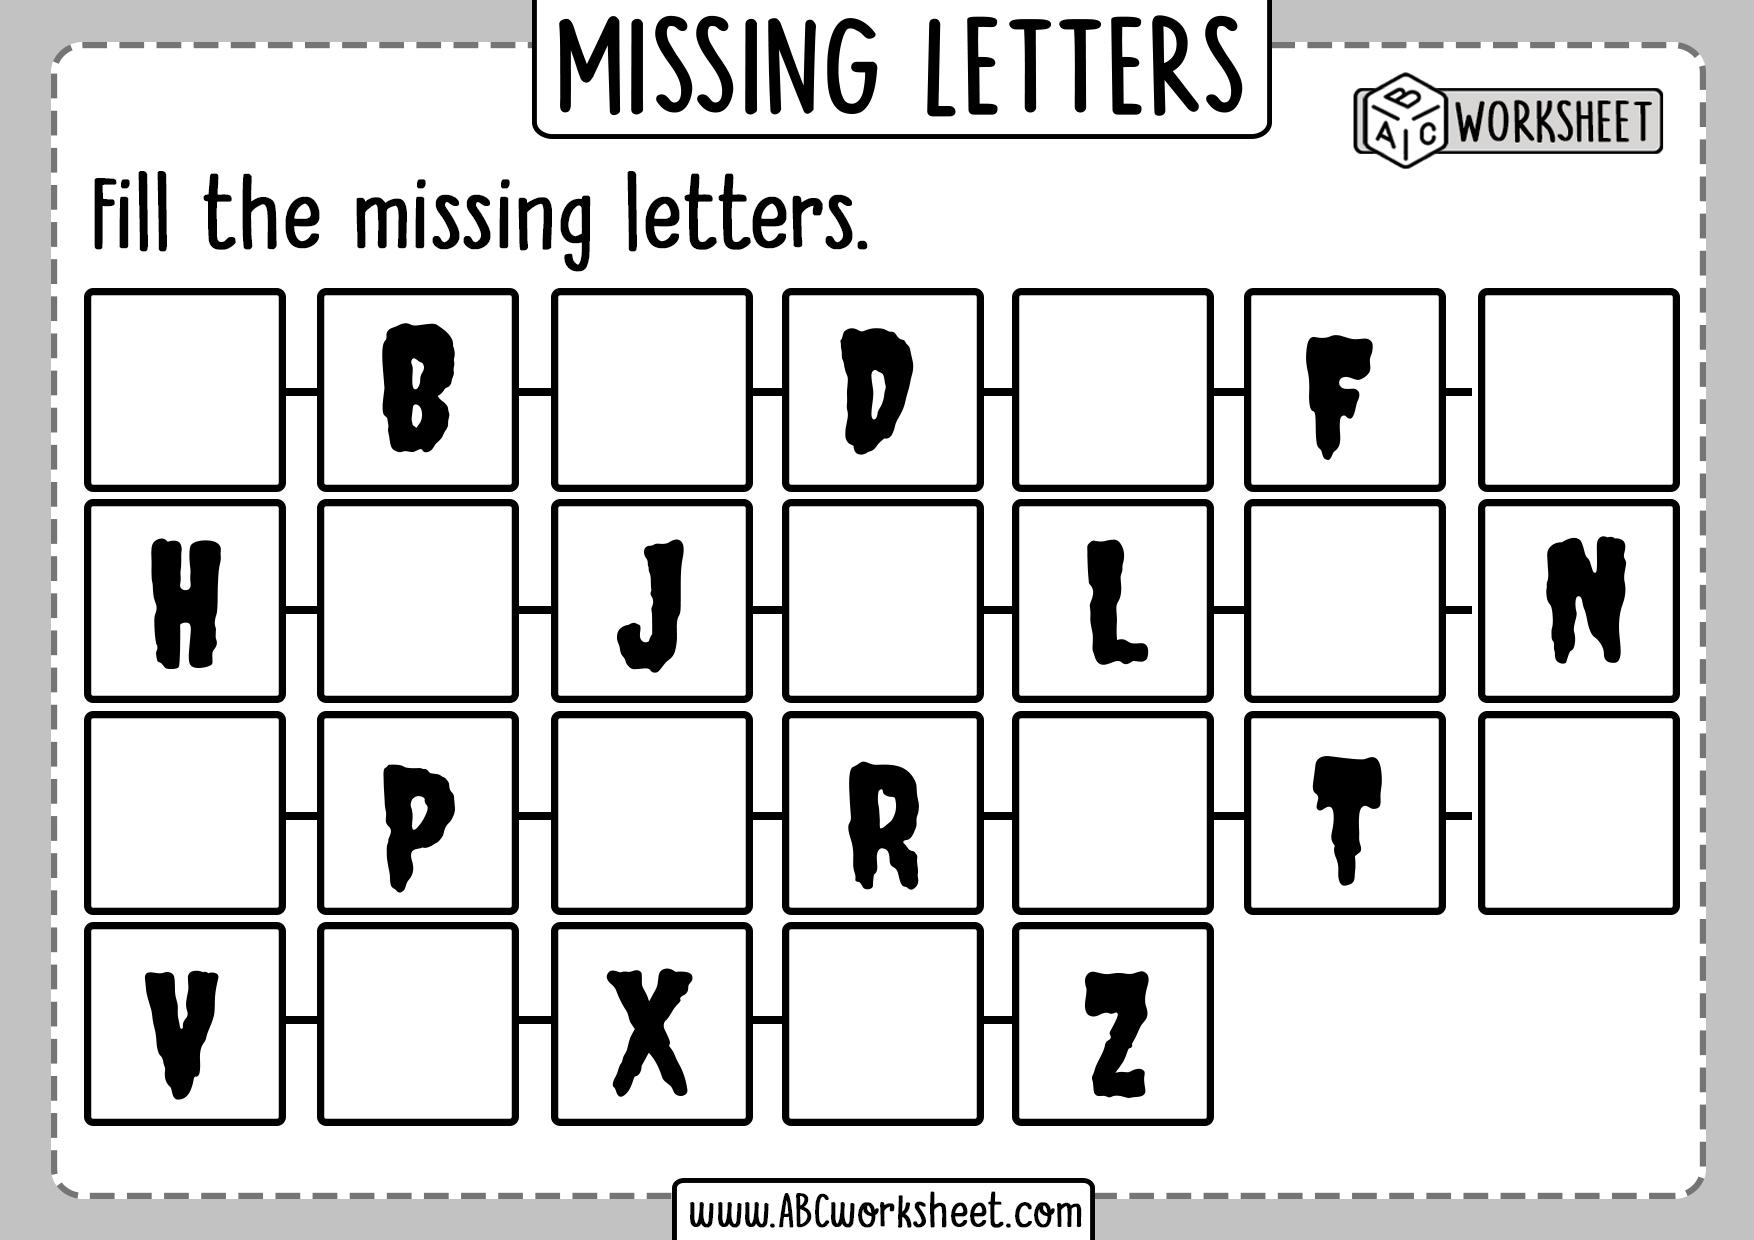 Missing Letters Worksheet For Grade 1